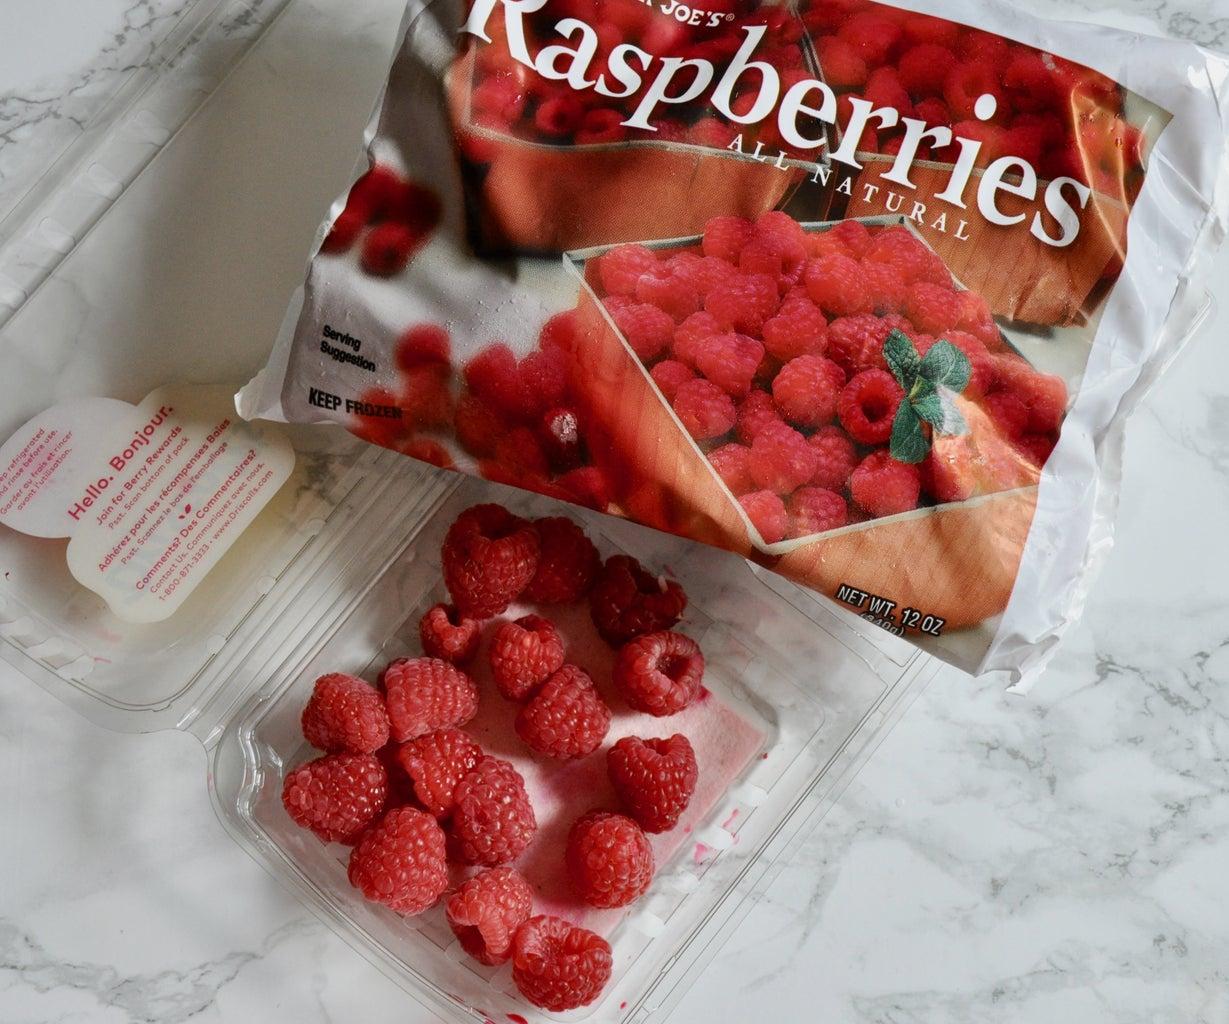 Frozen or Fresh Fruit?